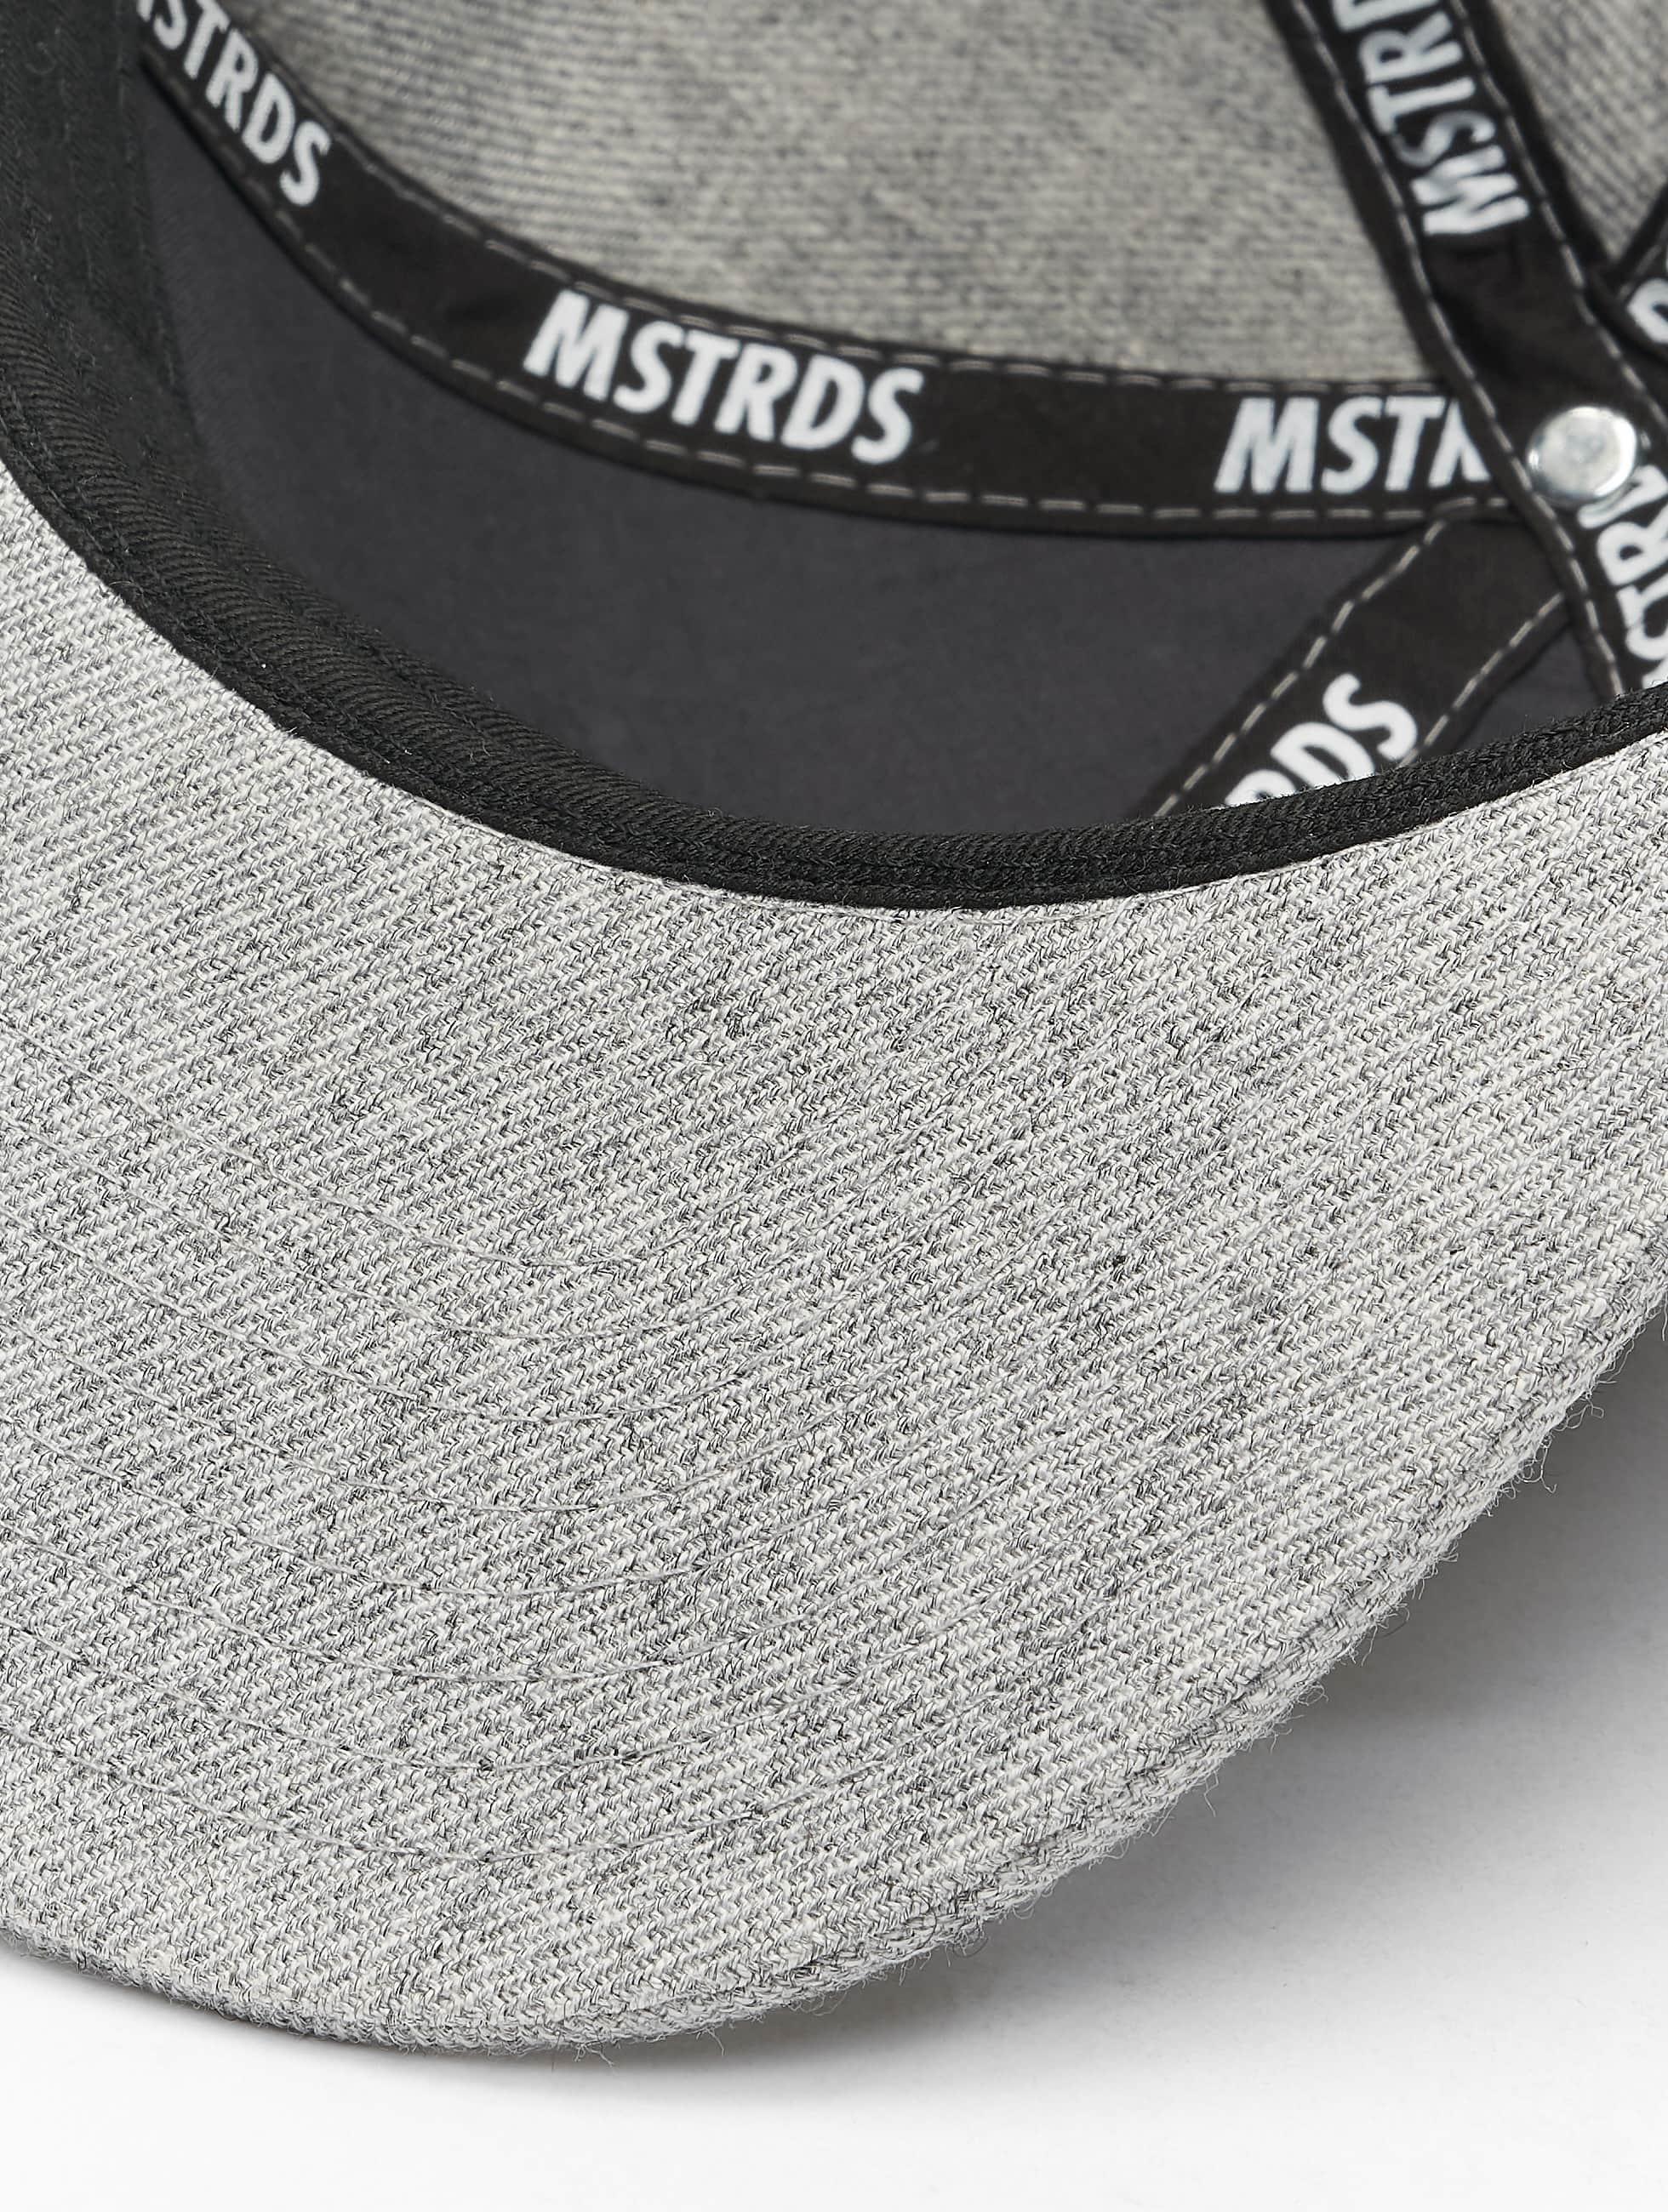 MSTRDS Snapback Cap X Letter grau